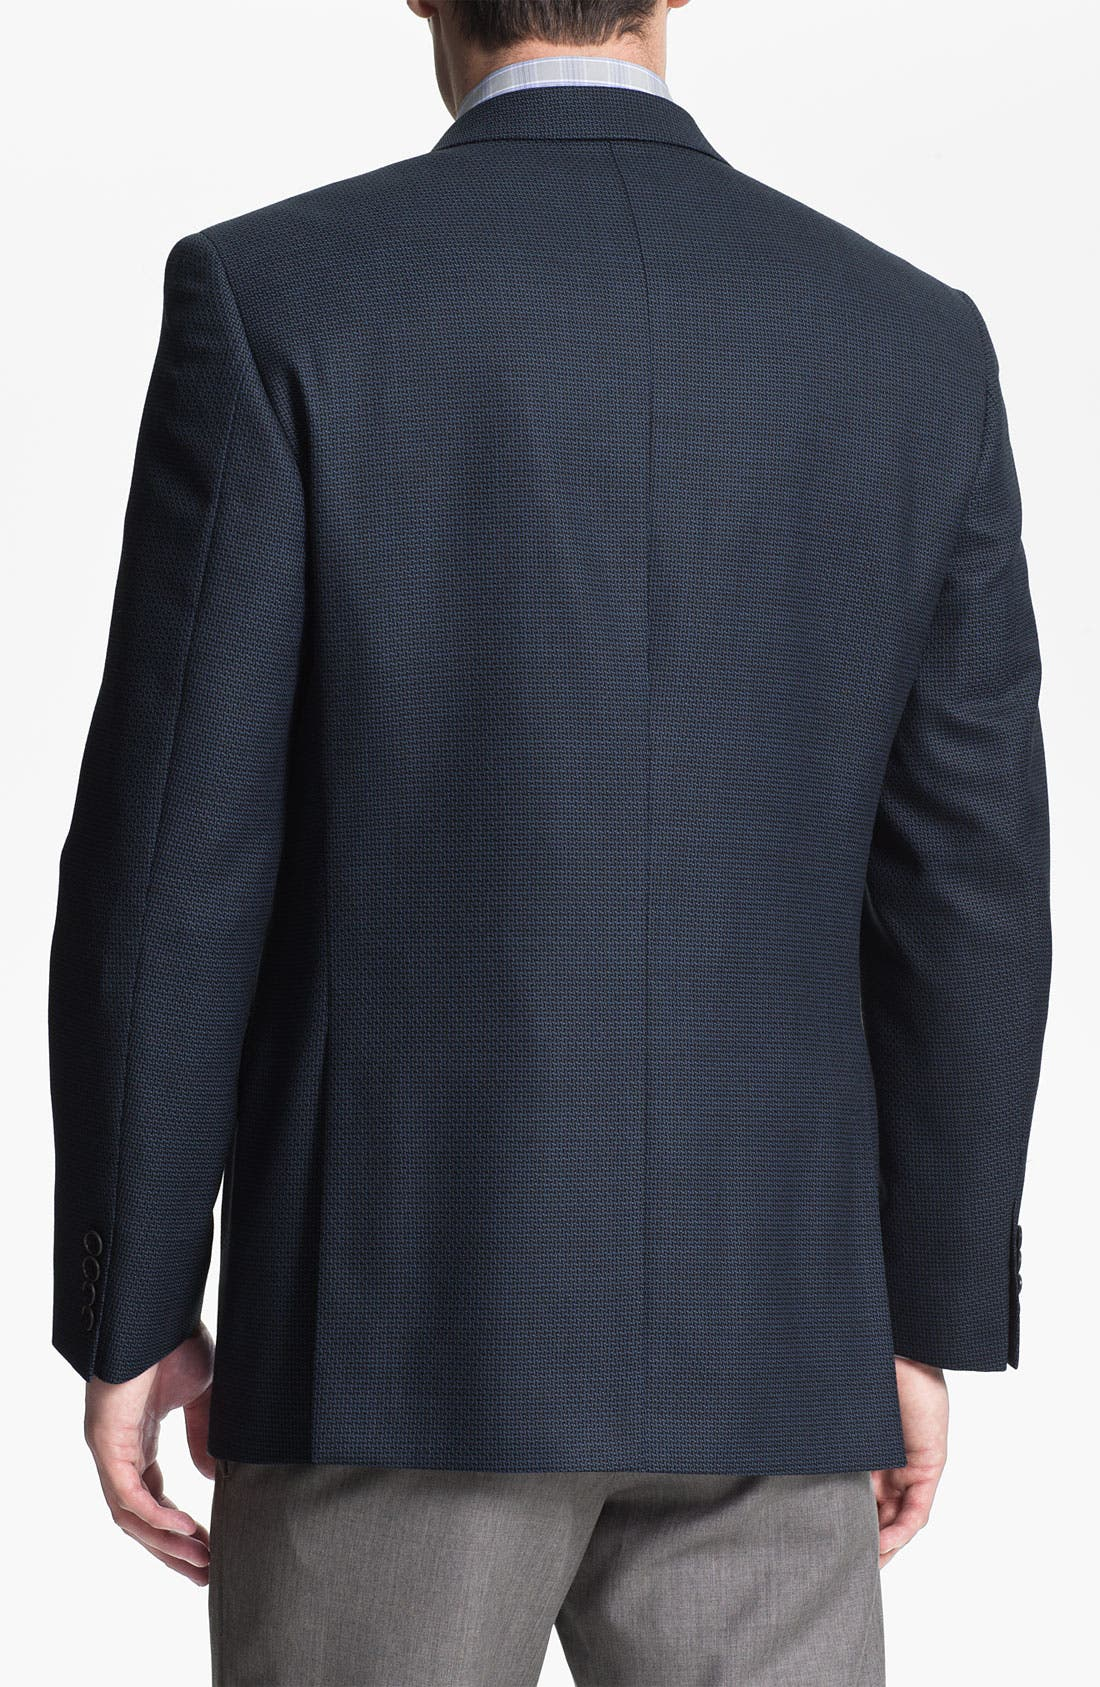 Alternate Image 2  - Joseph Abboud 'Signature Silver' Wool Sportcoat